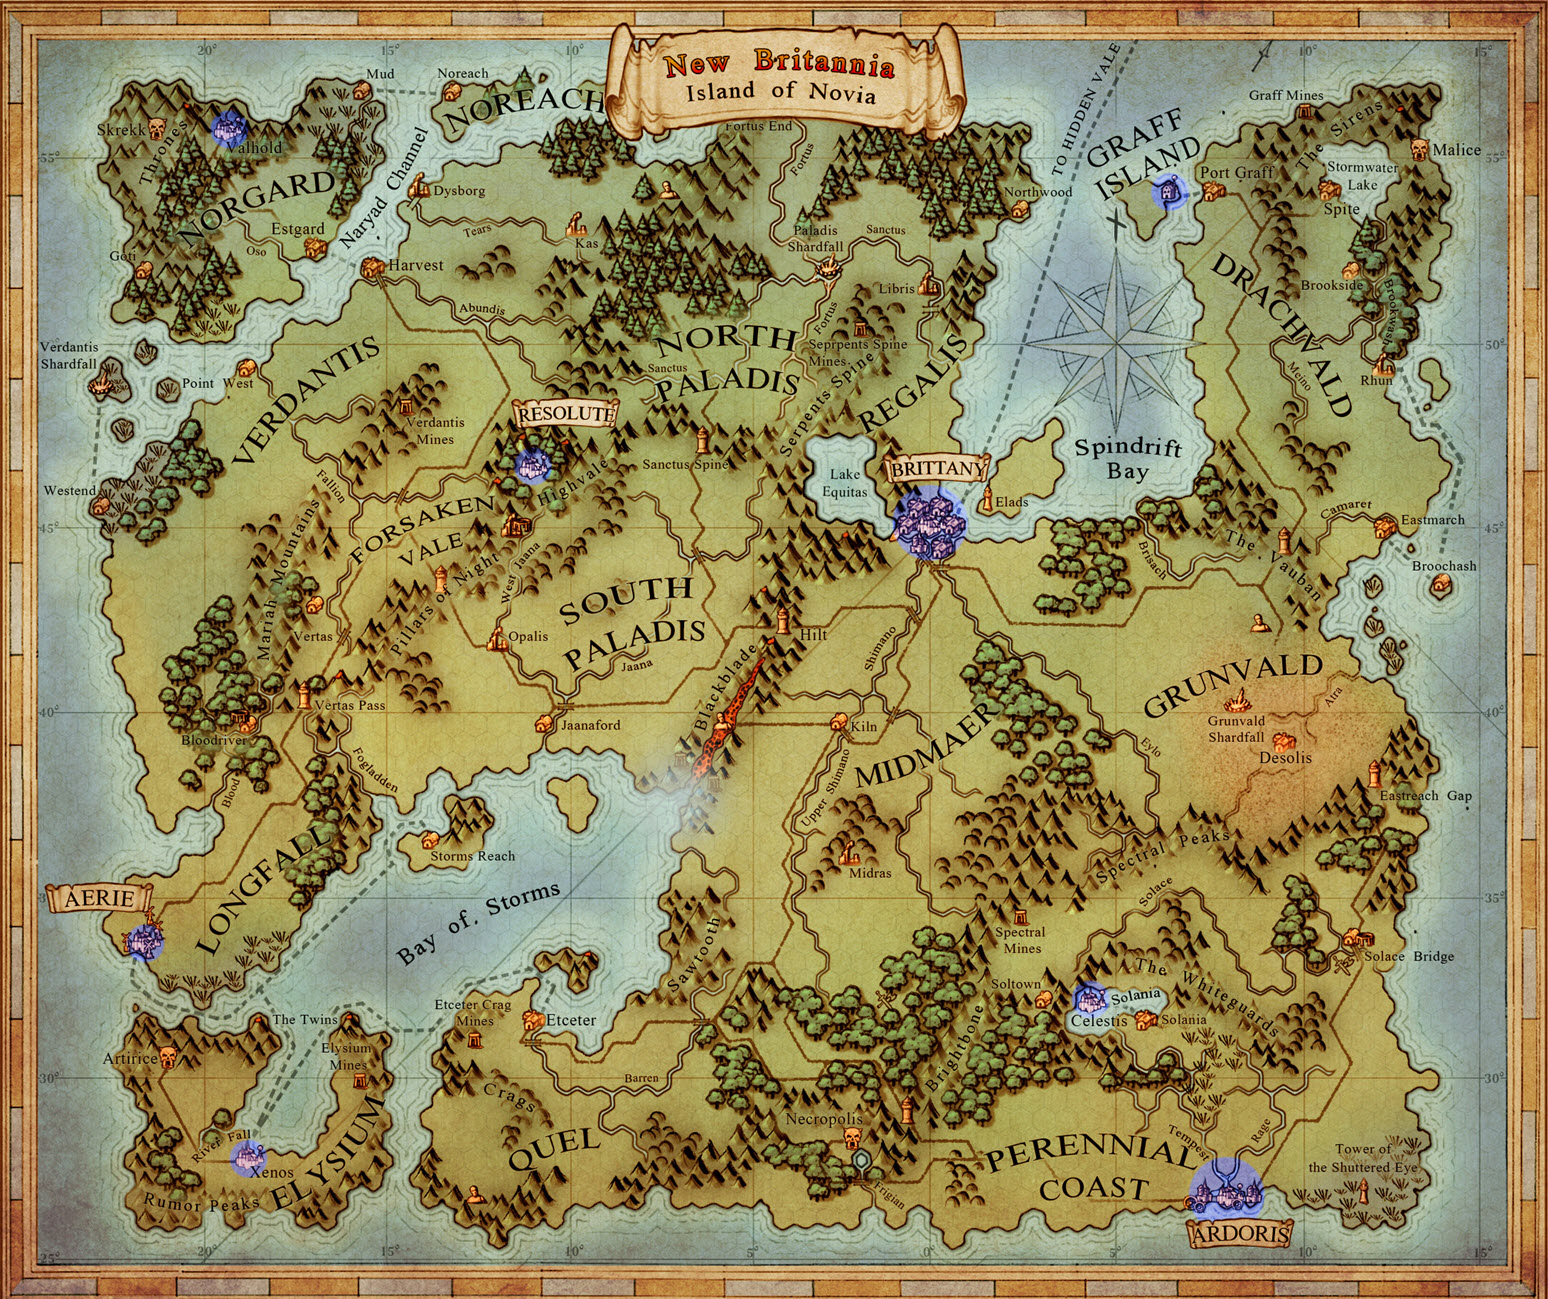 SotA_Novia_Map1.jpg